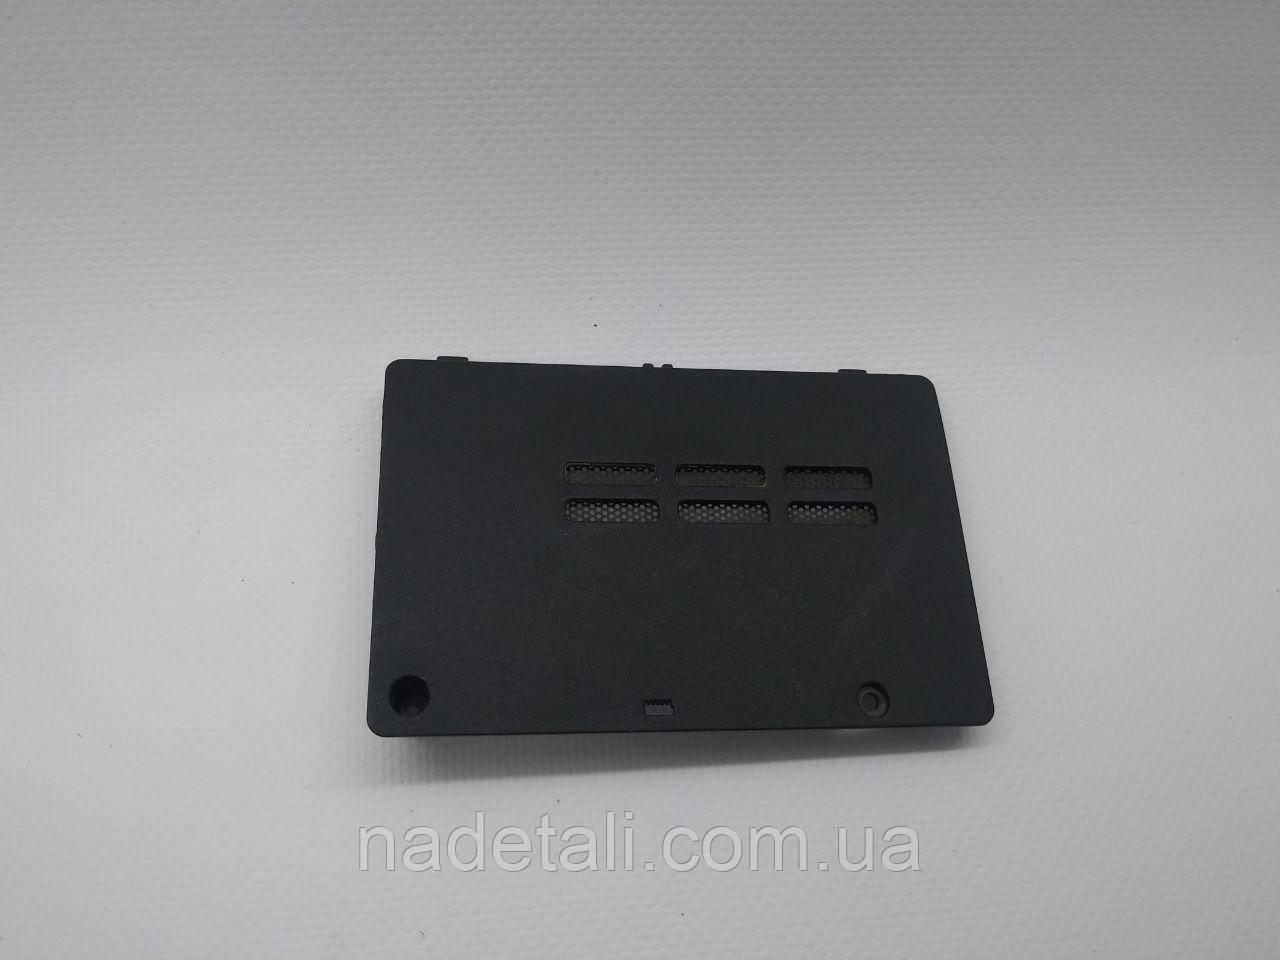 Сервисная крышка Acer Aspire 5536/5236 WIS604CG0600109